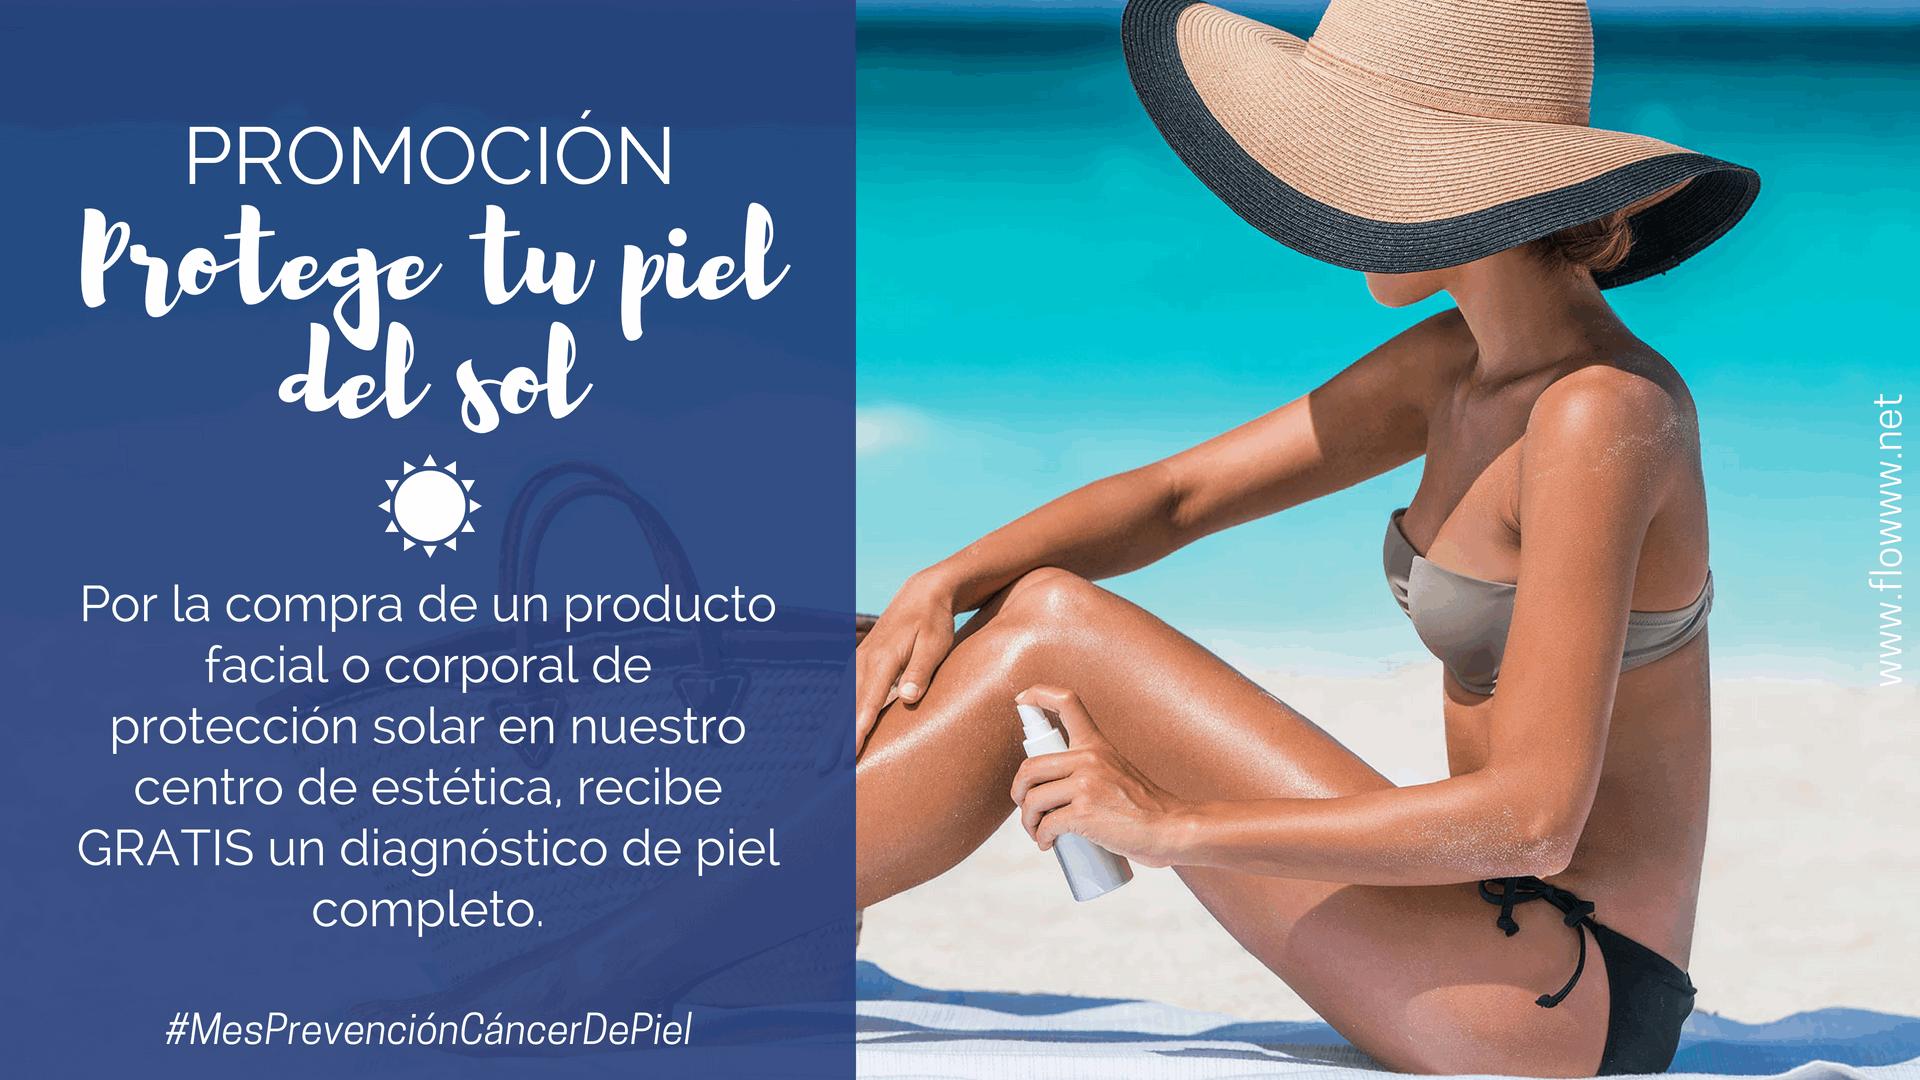 5_protege-tu-piel-promo-crema-solar-diagnostico